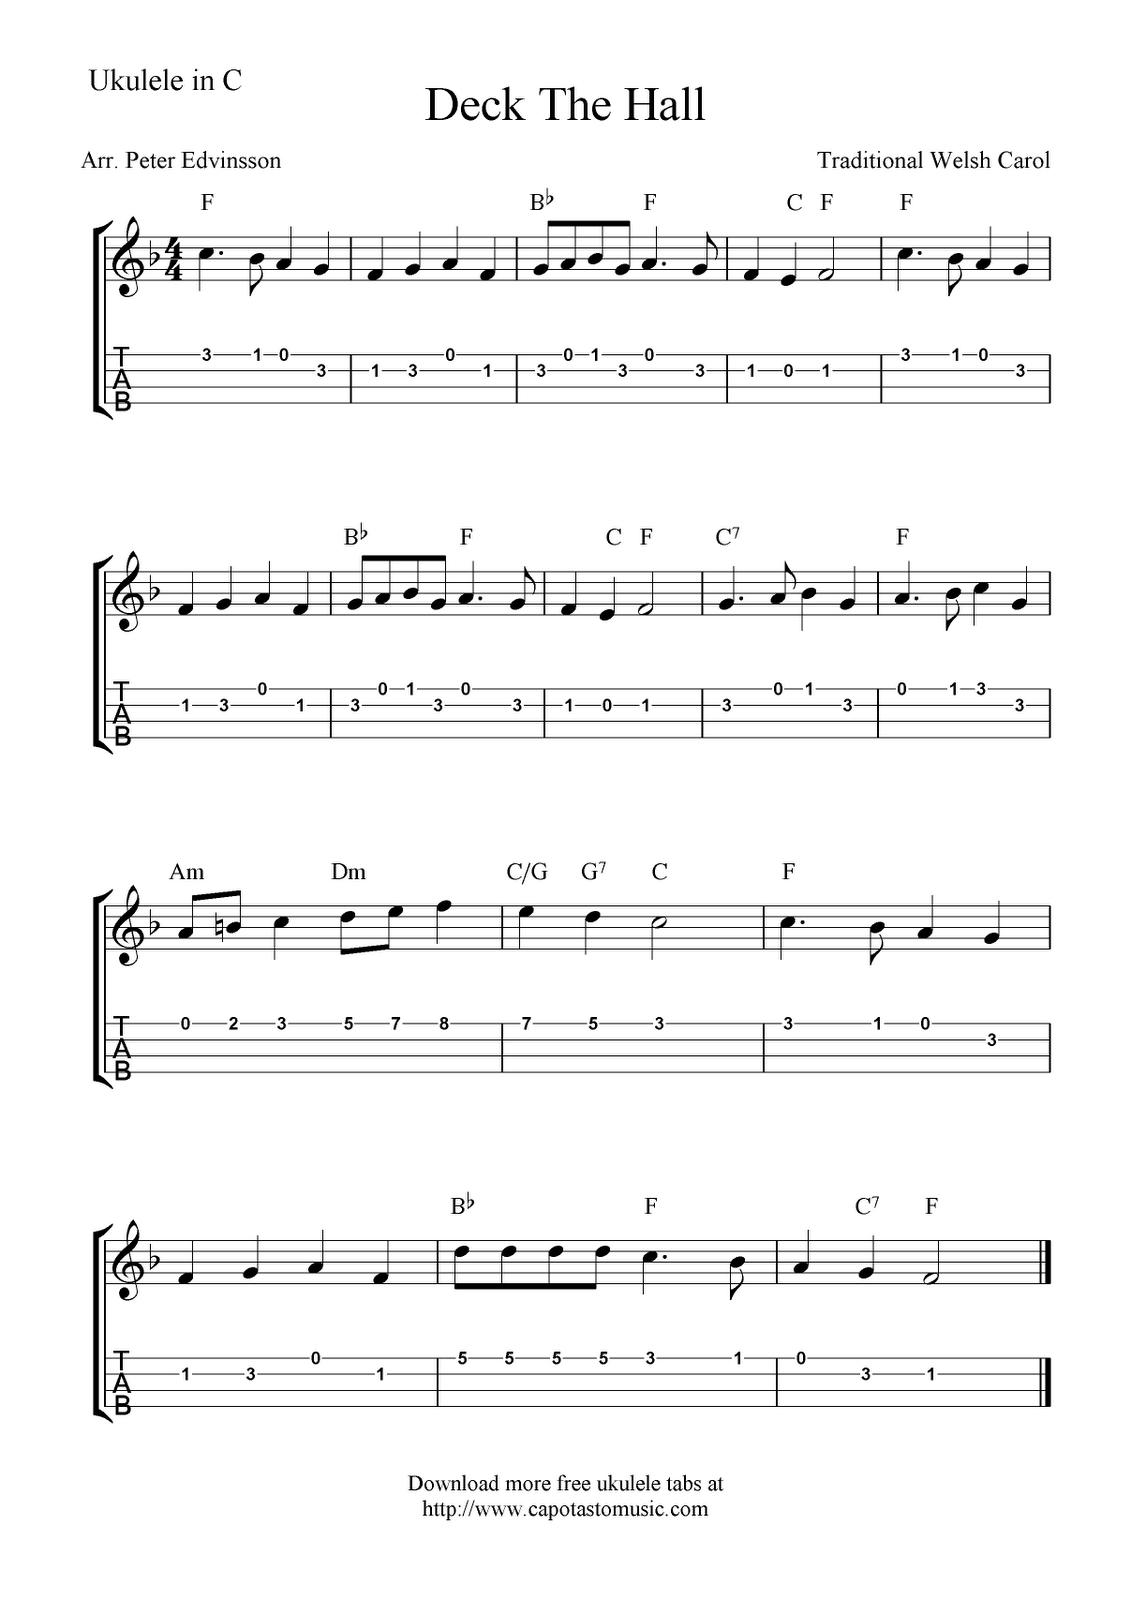 """Deck the Halls"" (Title Says ""Deck The Hall) Ukulele Sheet Music - Free Printable   Ukulele ..."